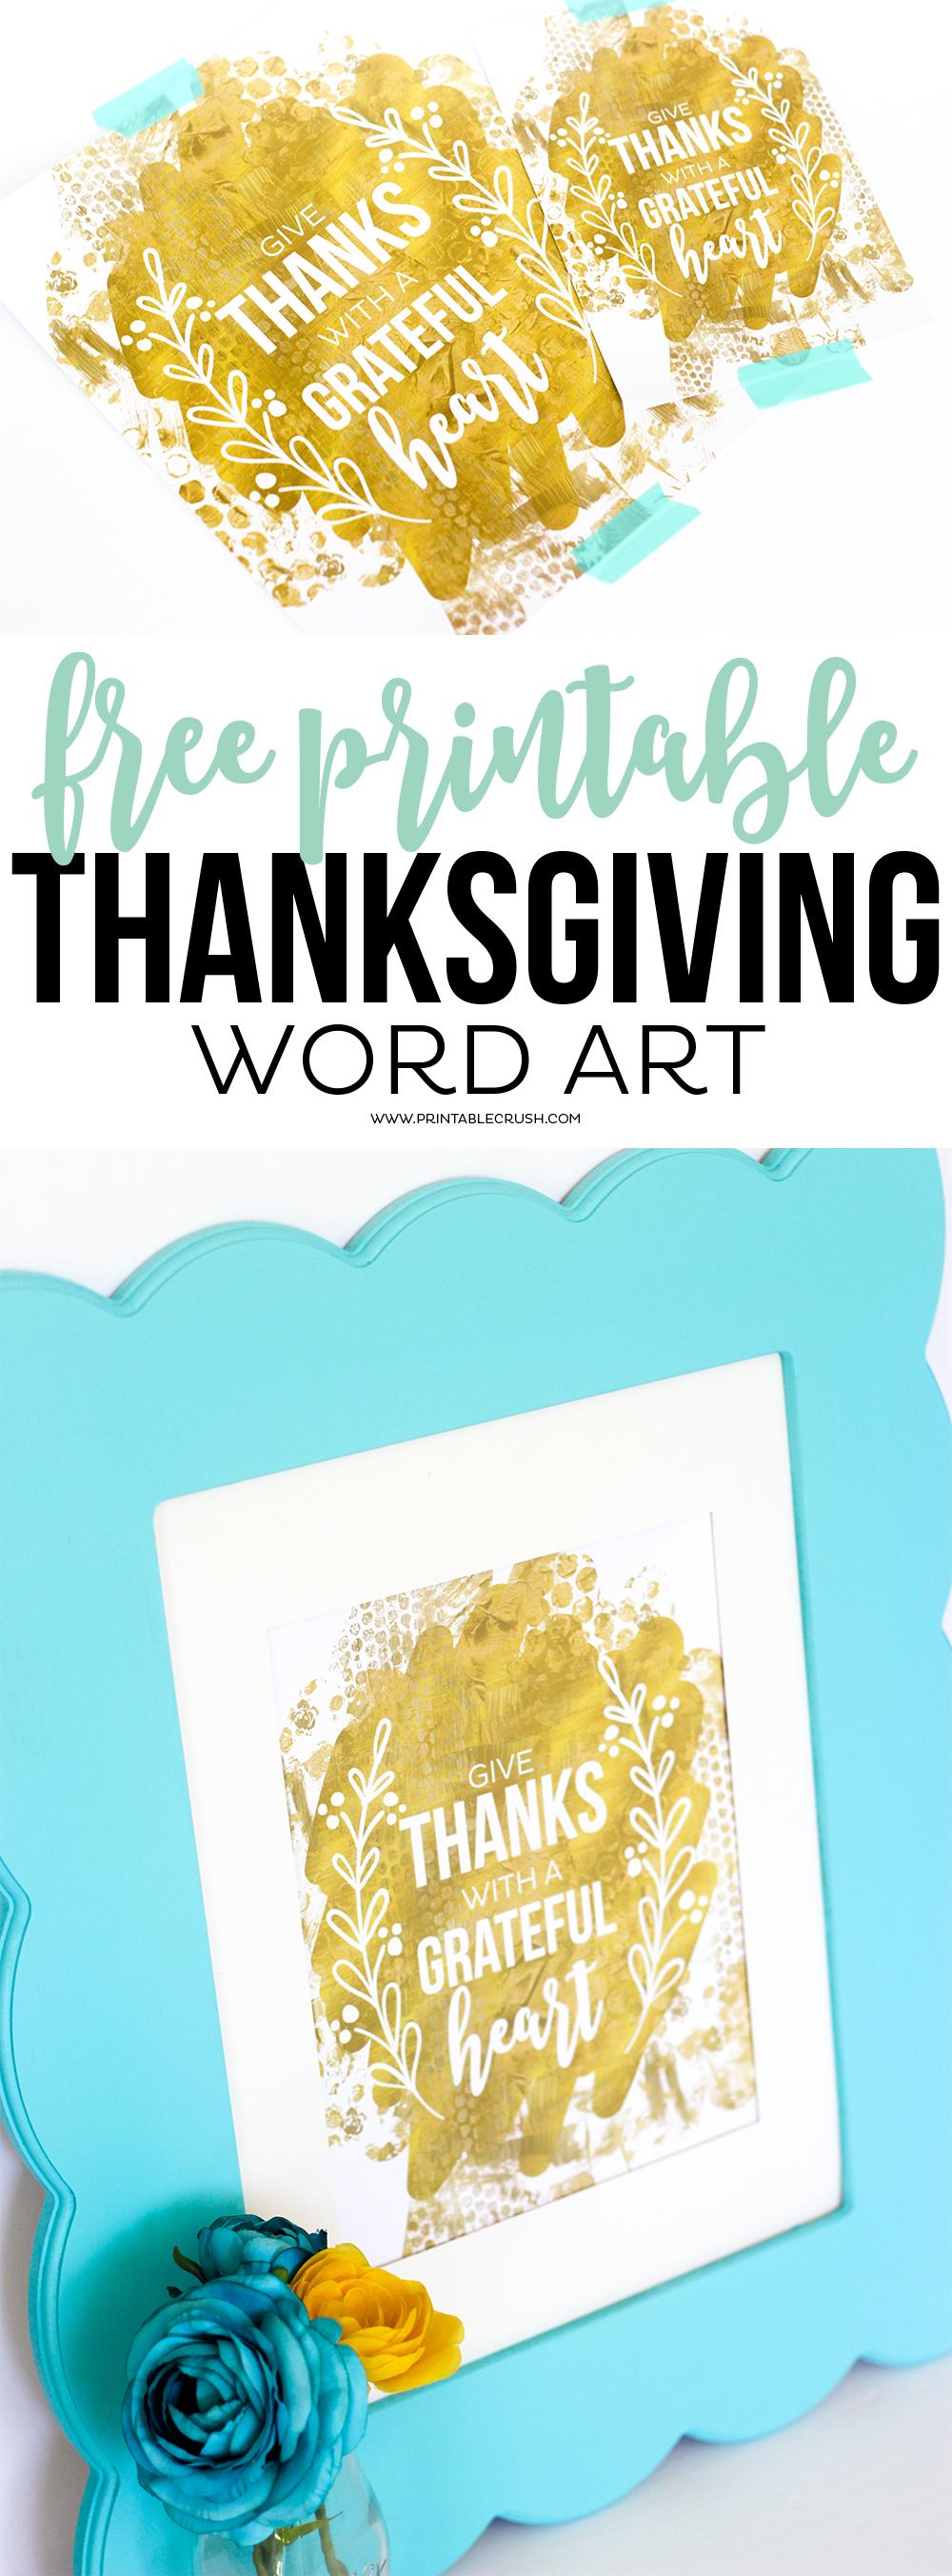 FREE Thanksgiving Printable Word Art - Printable Crush